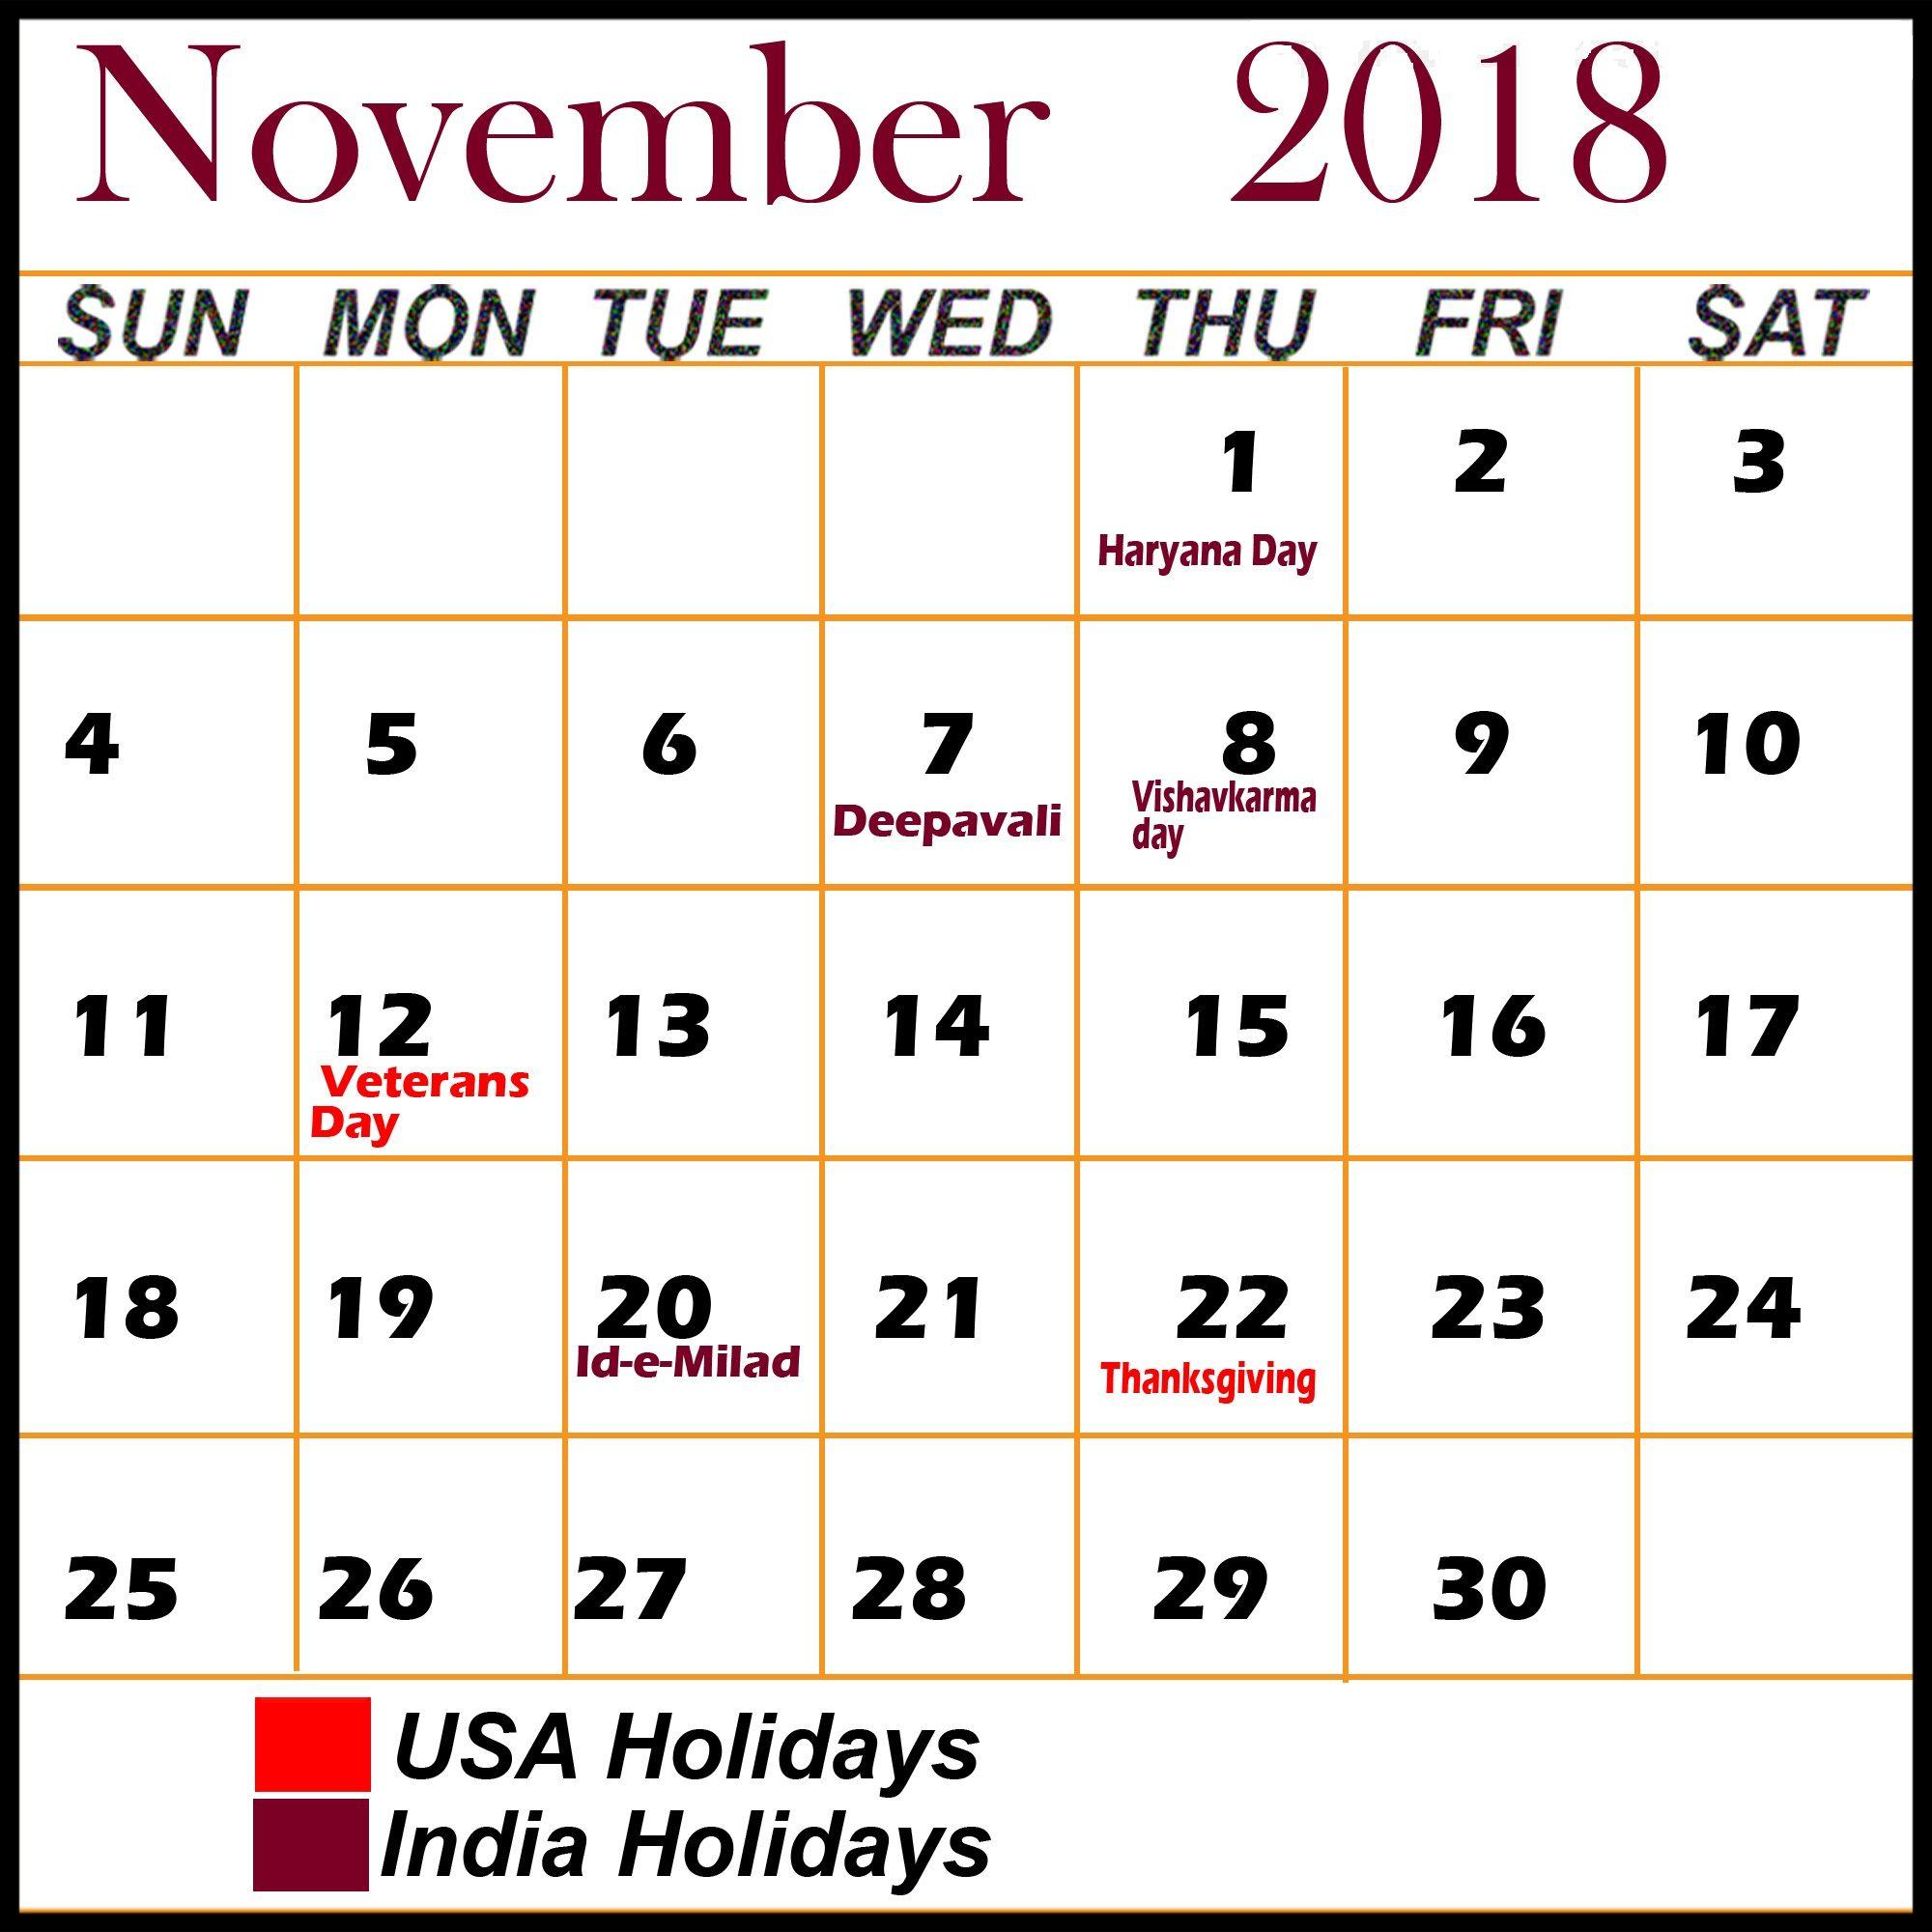 November 2018 Calendar With Holidays 2018 Holiday Calendar